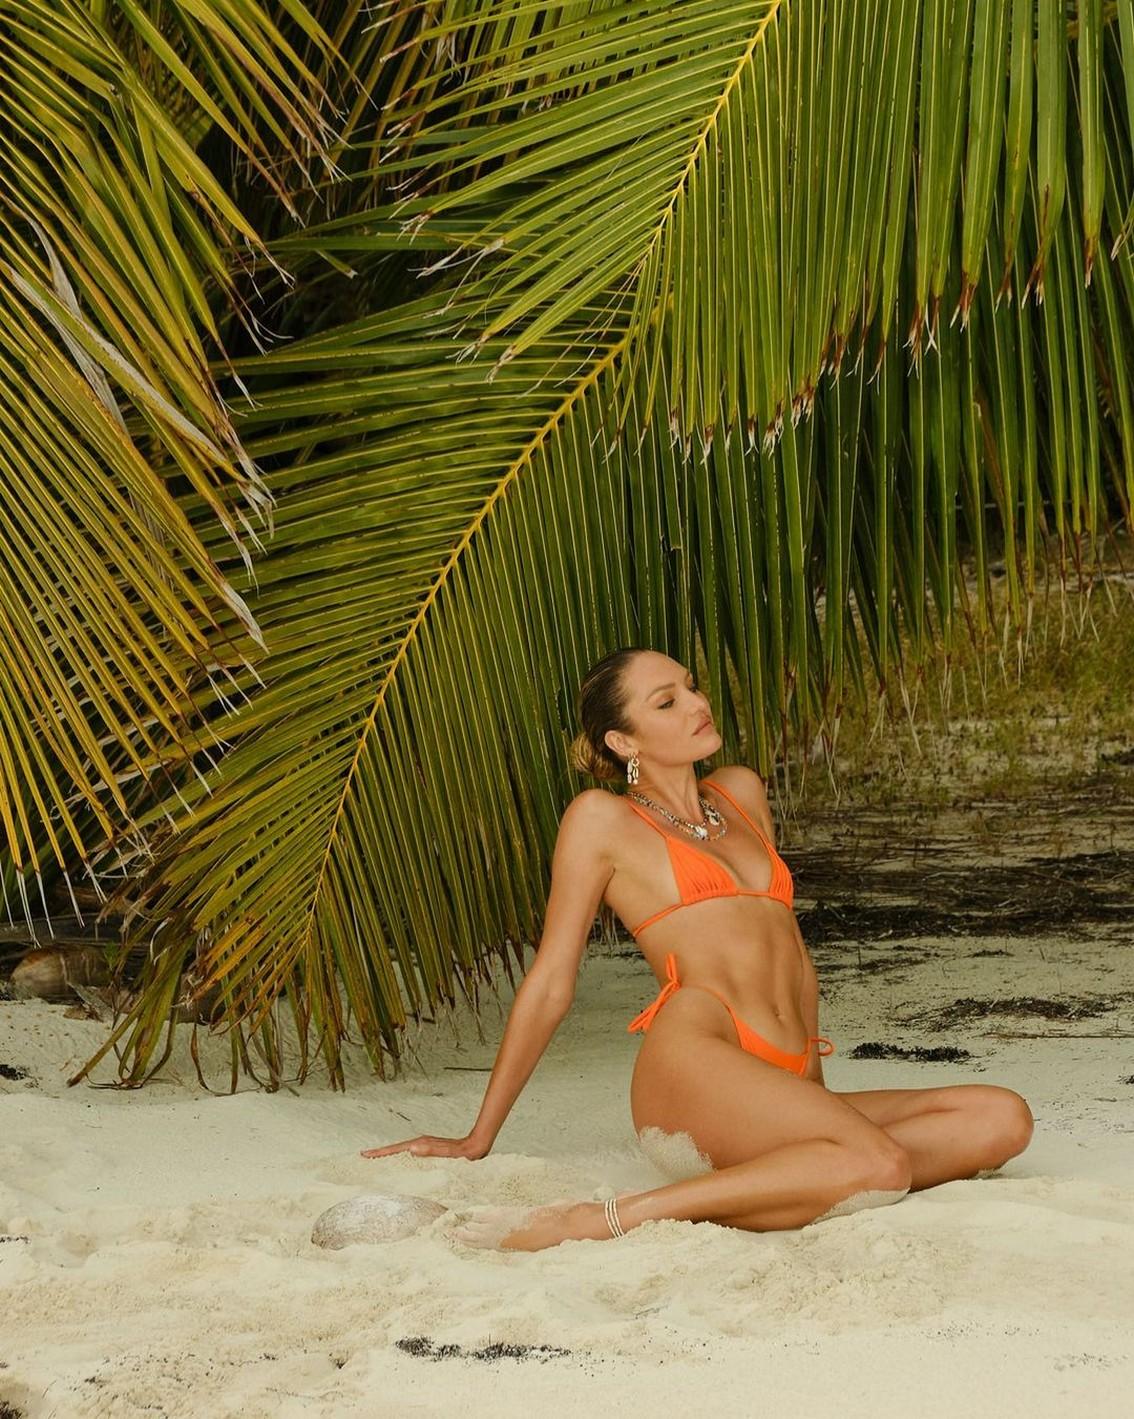 Candice Swanepoel Tiny Tits Bikini